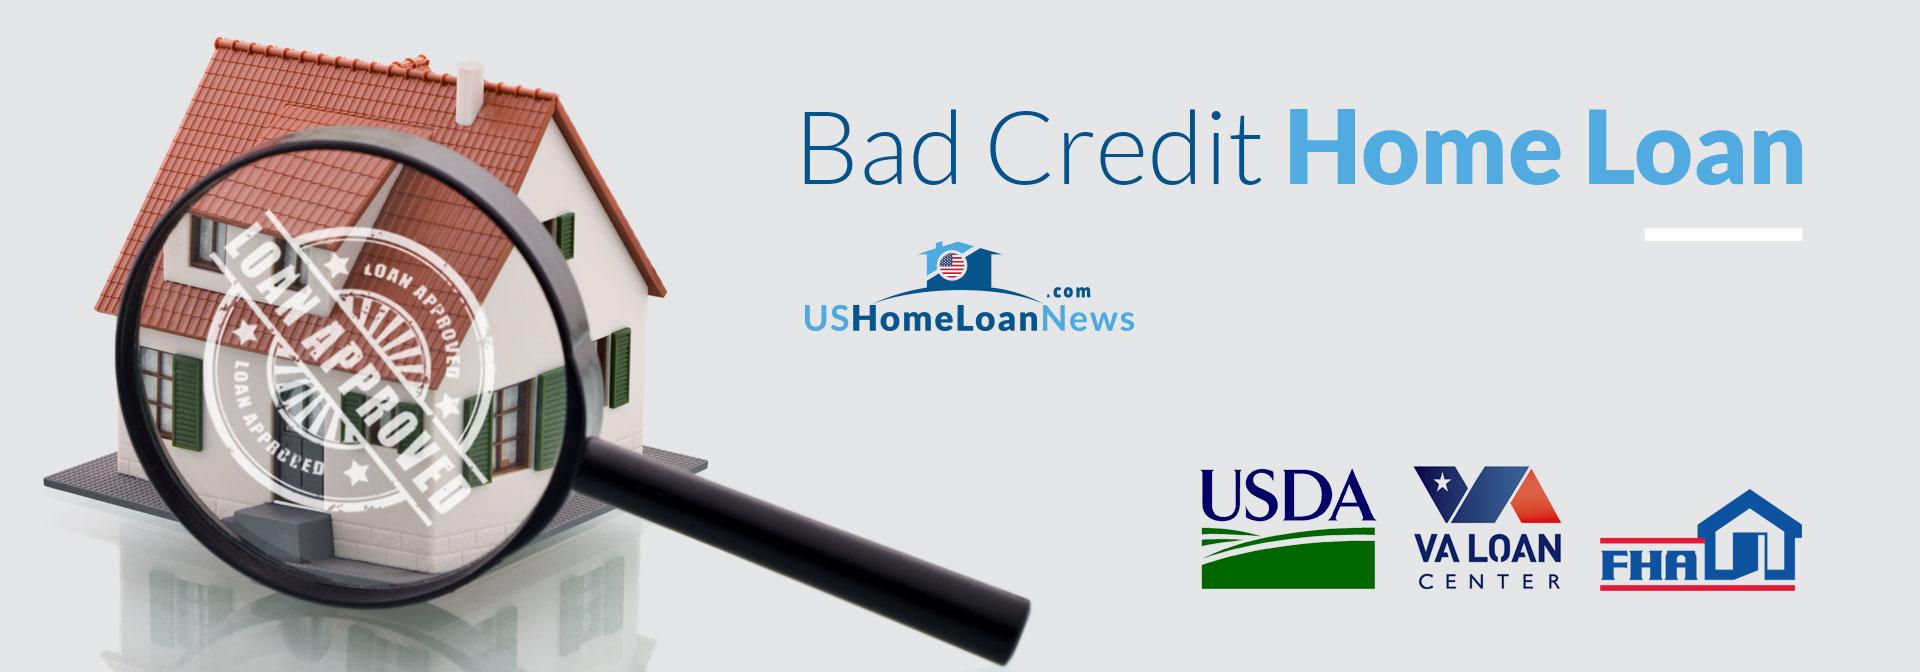 Bad Credit Home Loans of VA Homeloans USDA Homeloans FHA Homeloans